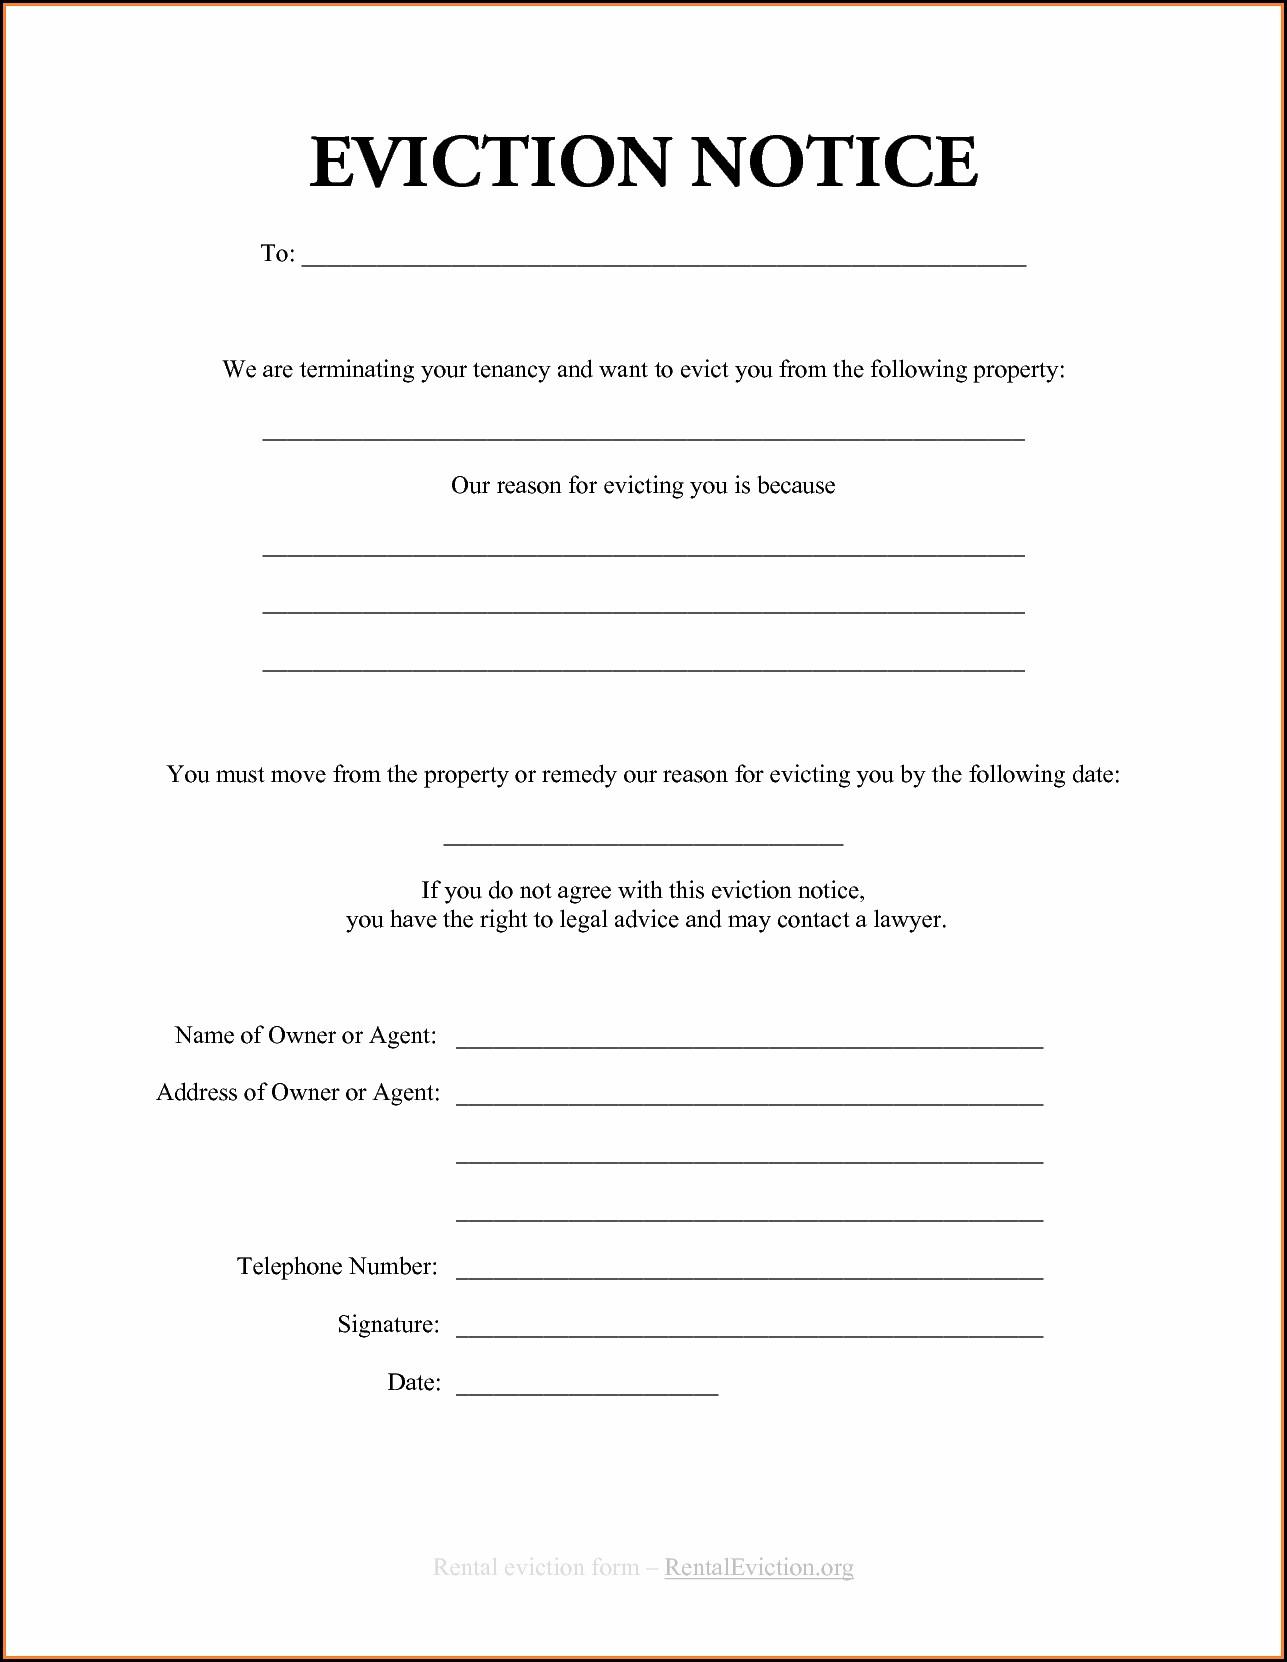 Printable Eviction Forms